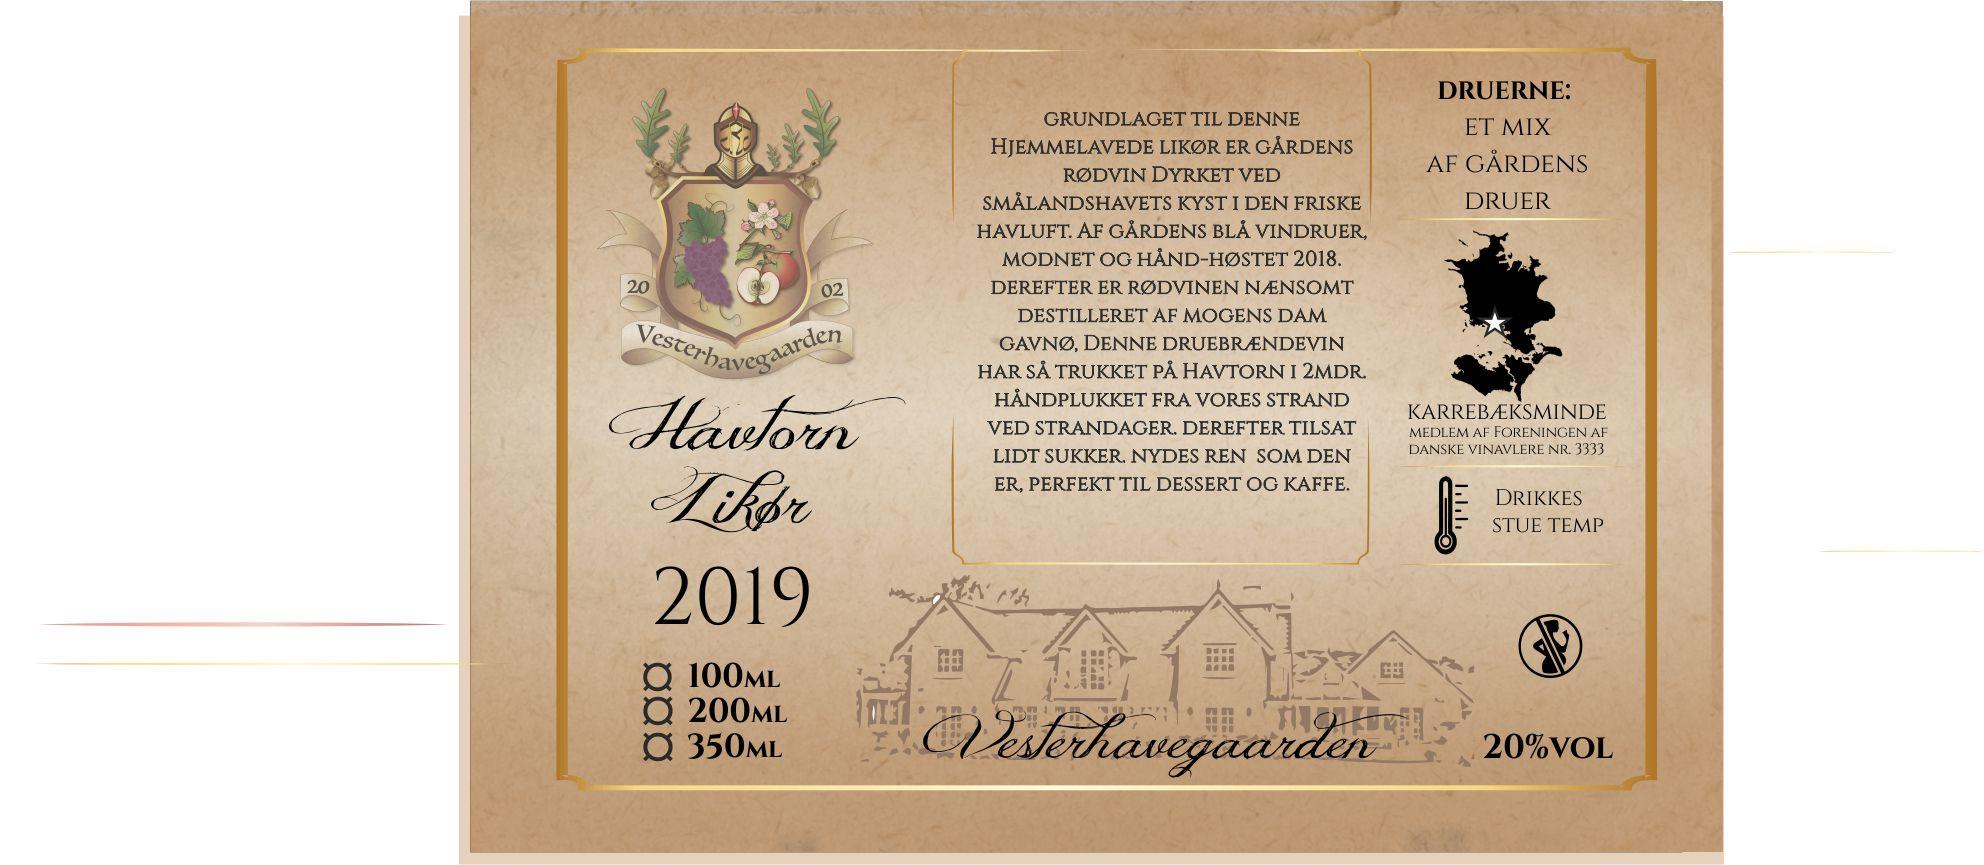 LIKØR, HAVTORN, 2020, 200ml, 20%